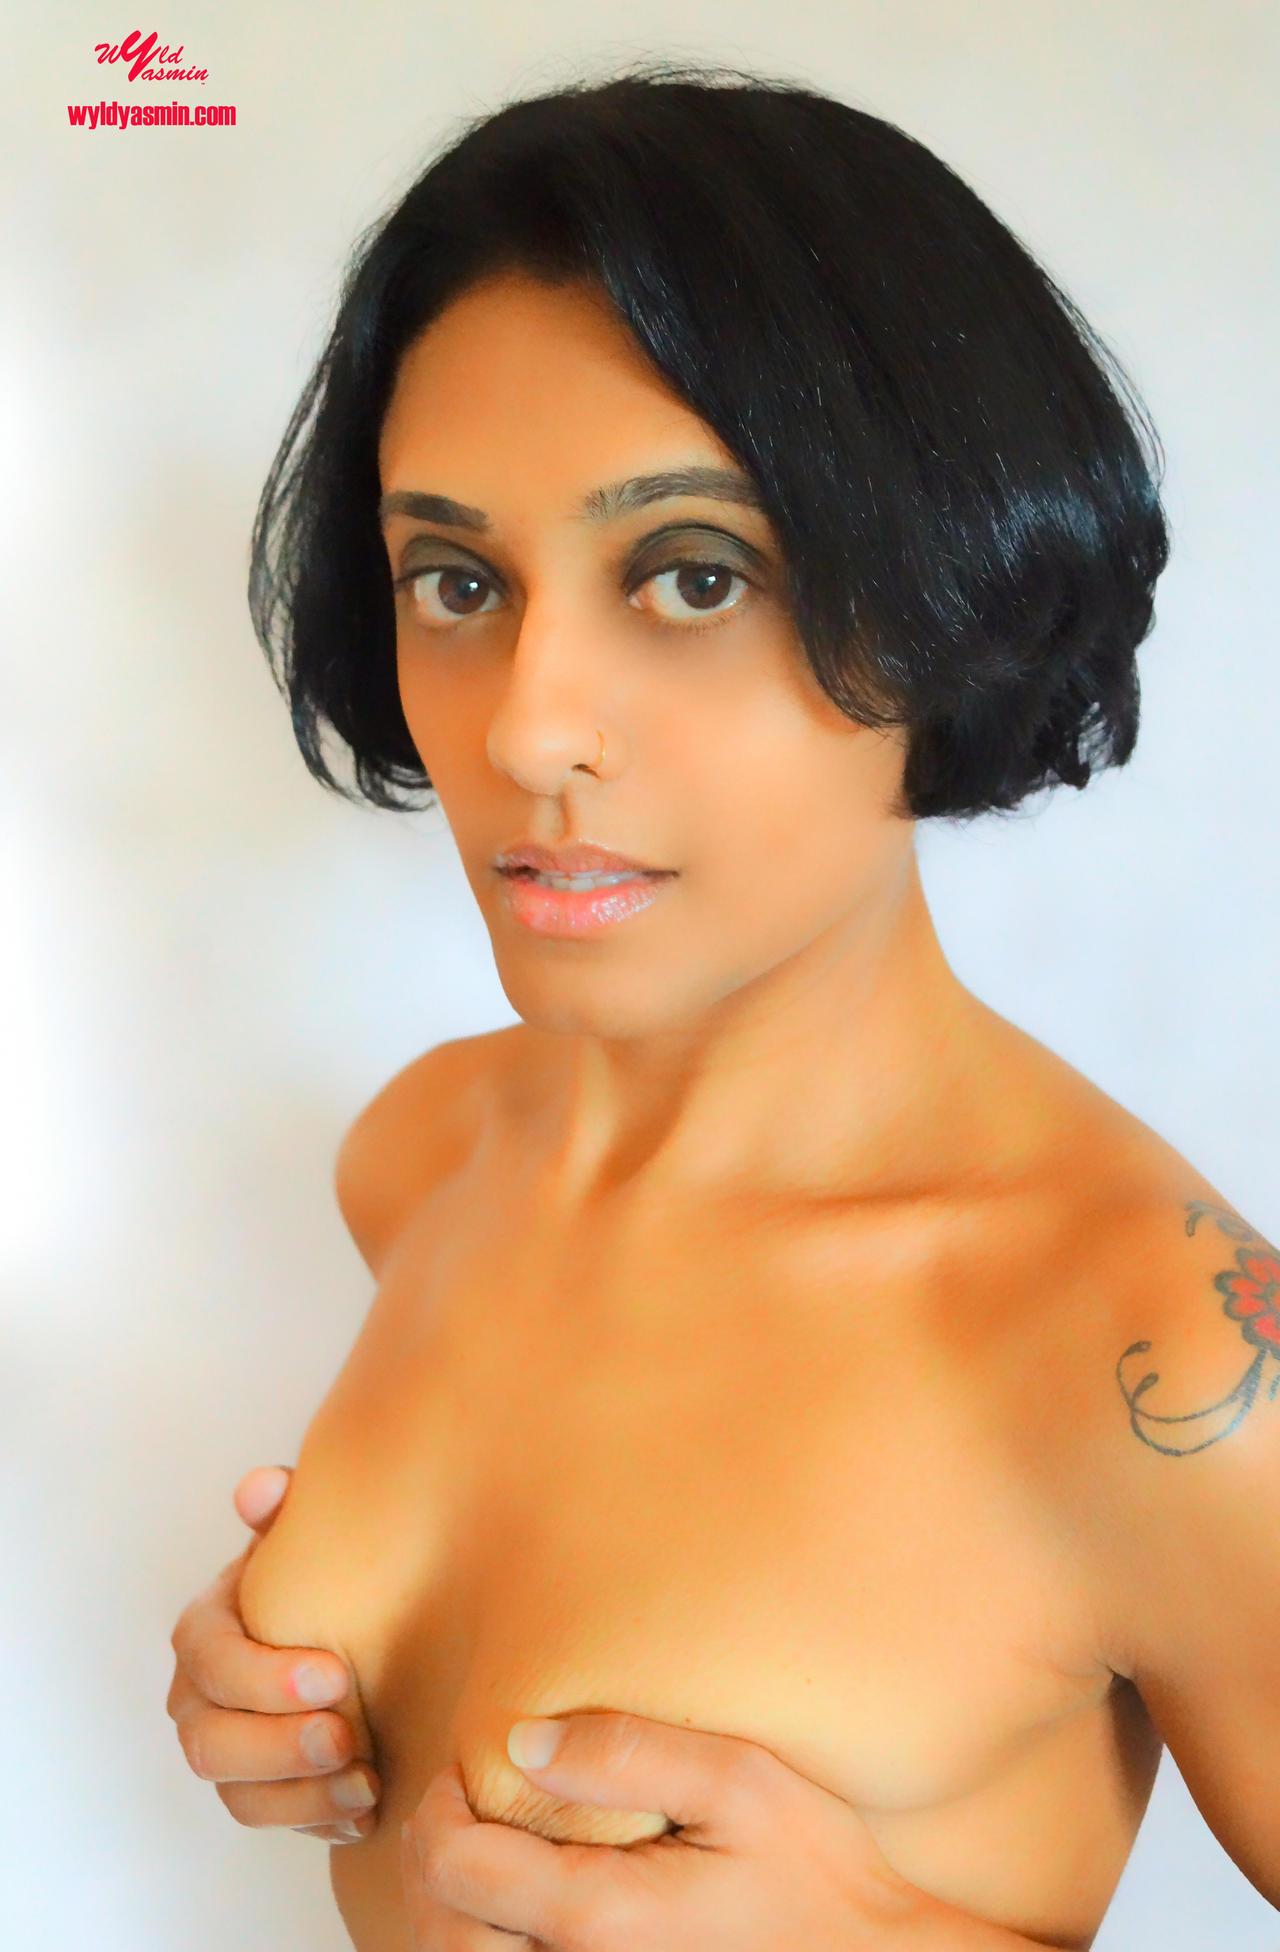 Sensual Zahra Soltanian (Wyld Yasmin)